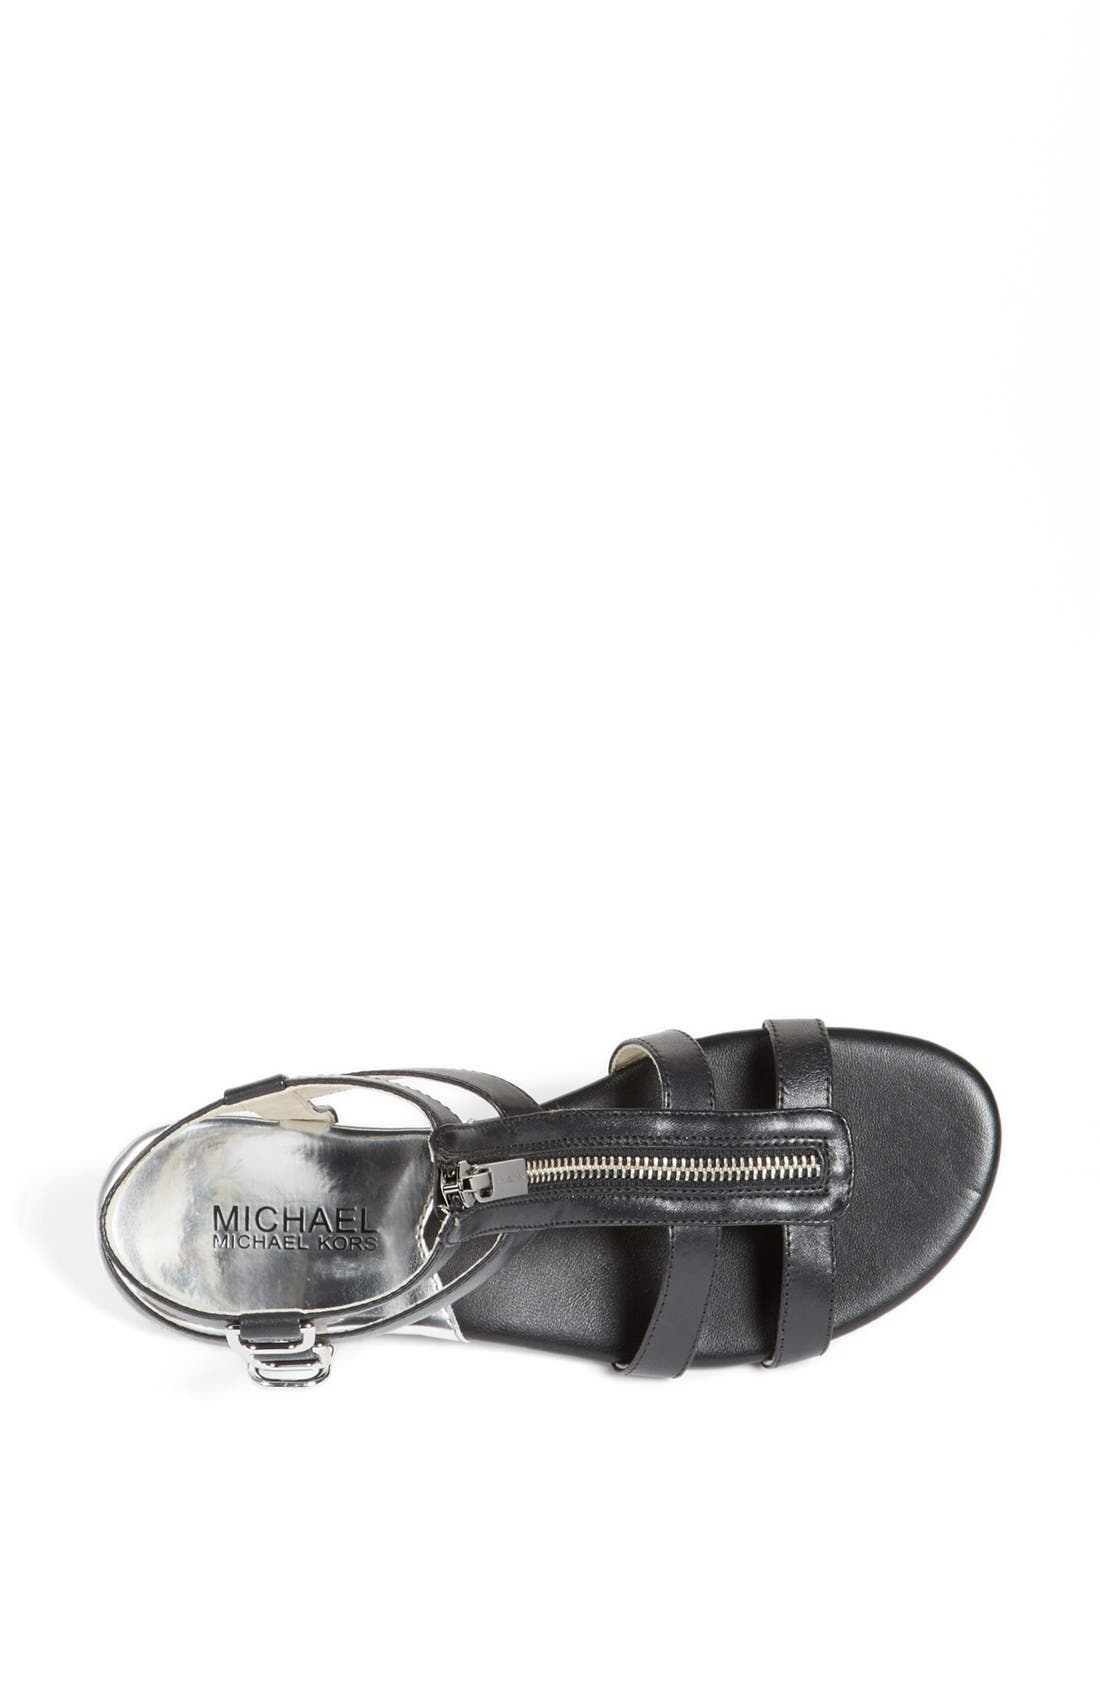 Alternate Image 3  - MICHAEL Michael Kors 'Kennedy' Flat Leather Gladiator Sandal